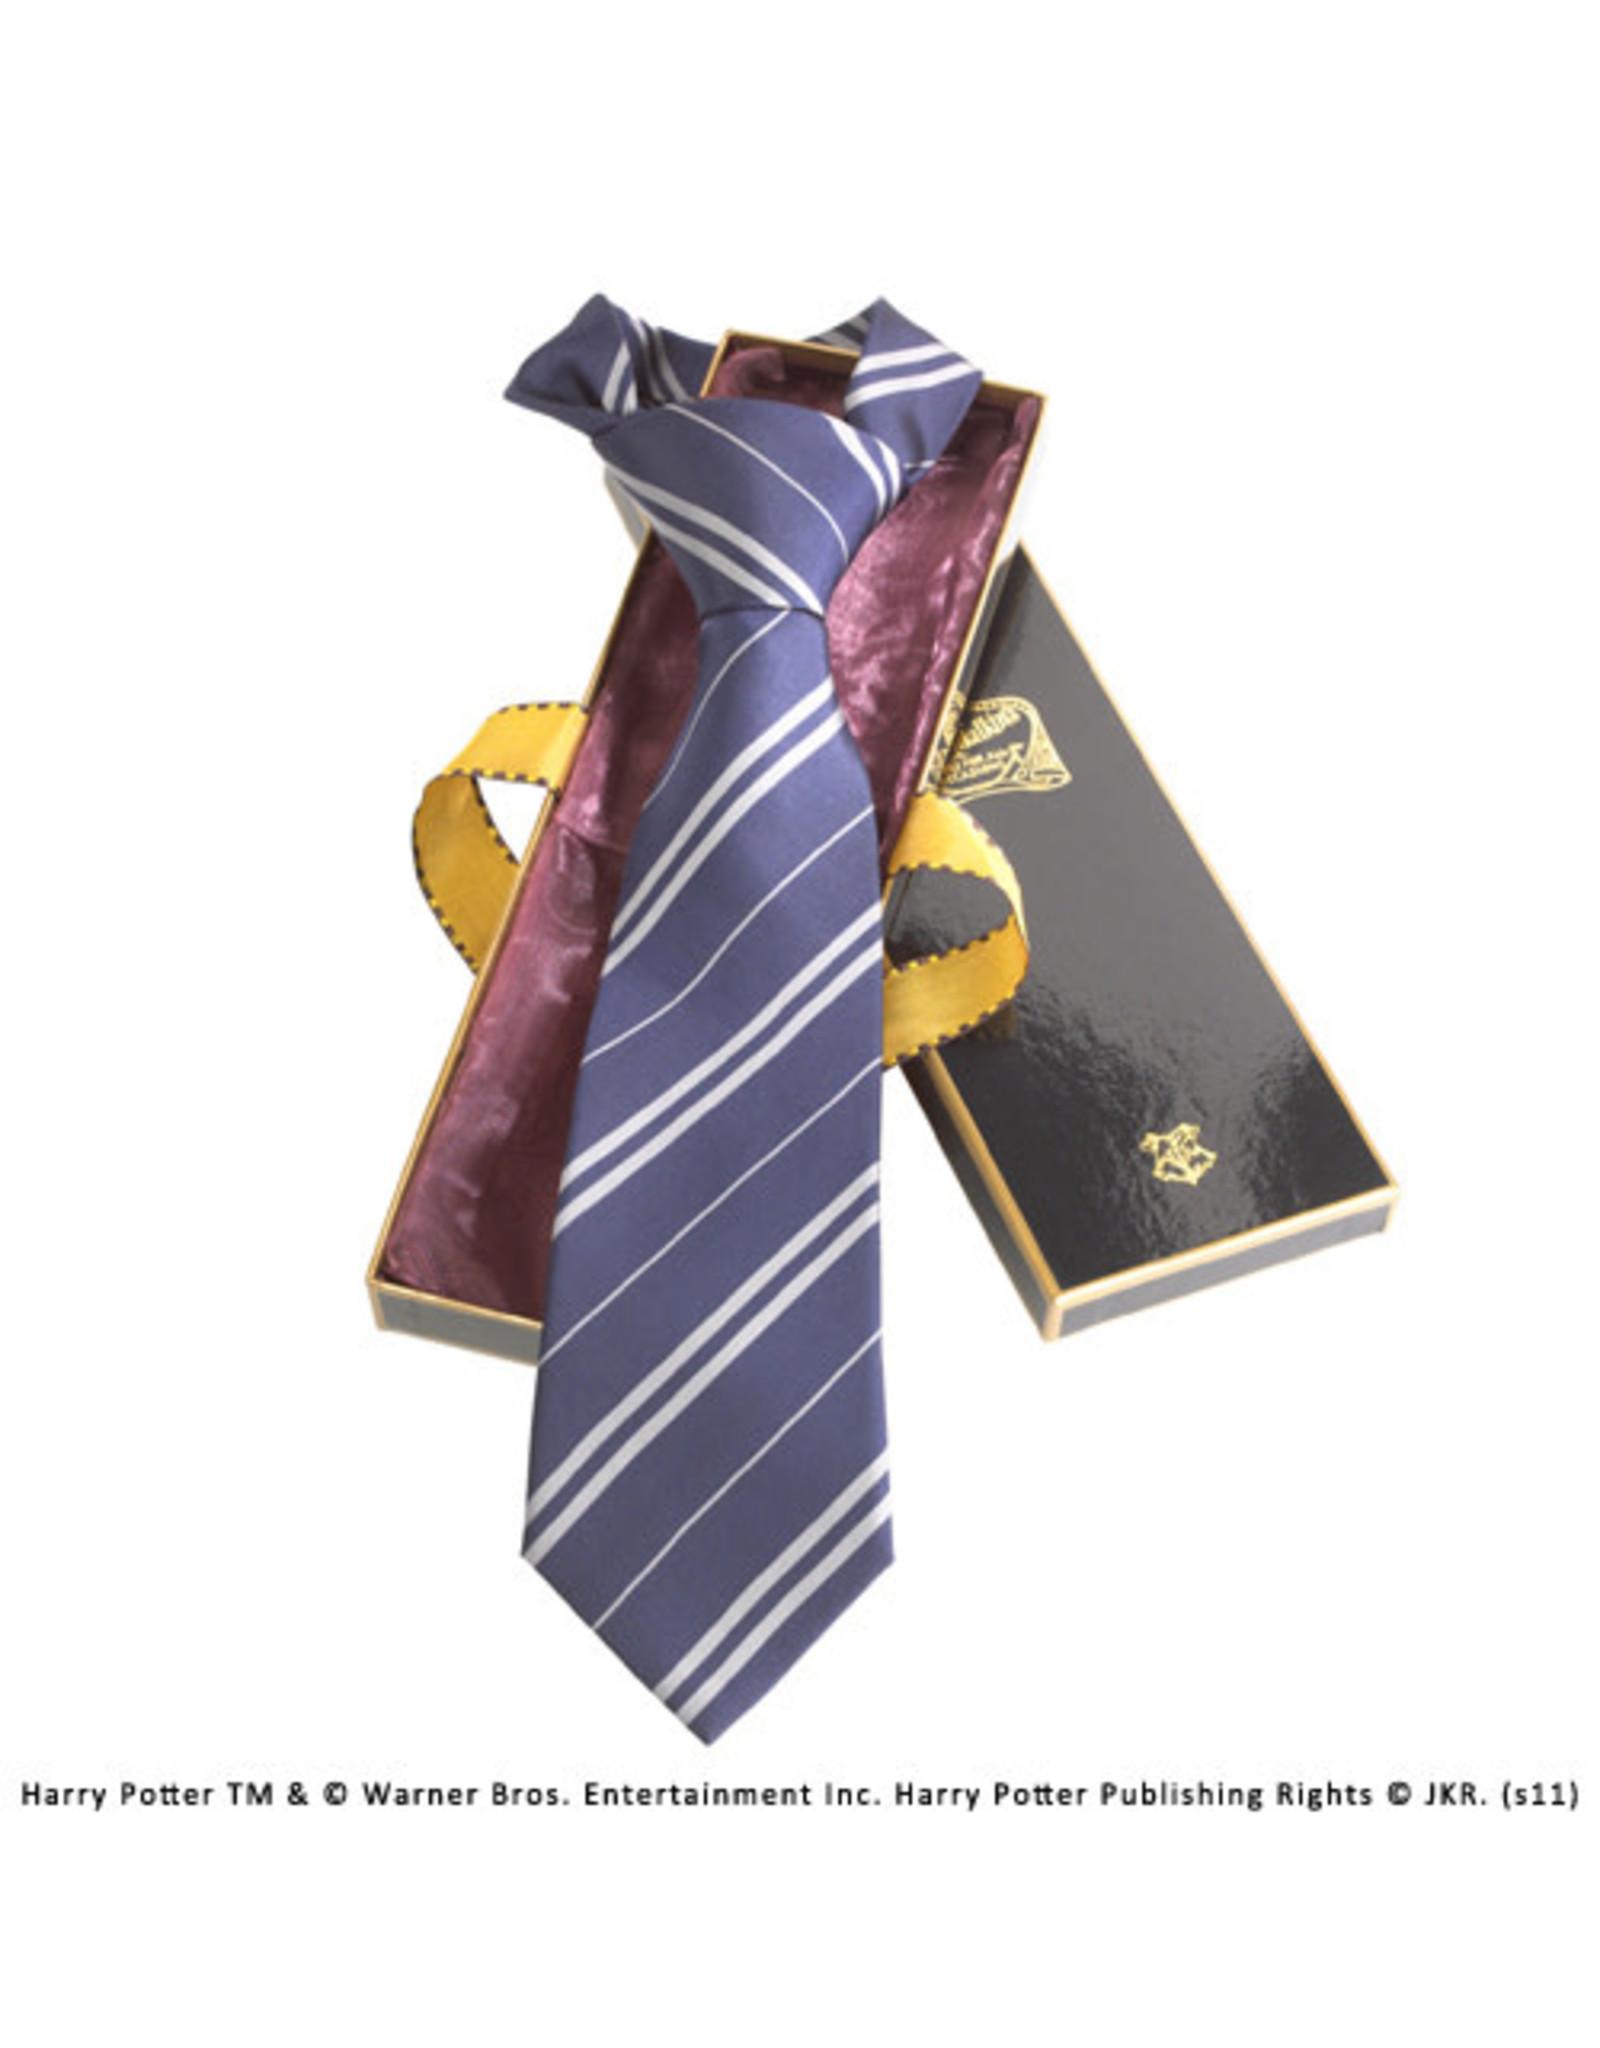 HARRY POTTER House Tie 100% Silk - Ravenclaw